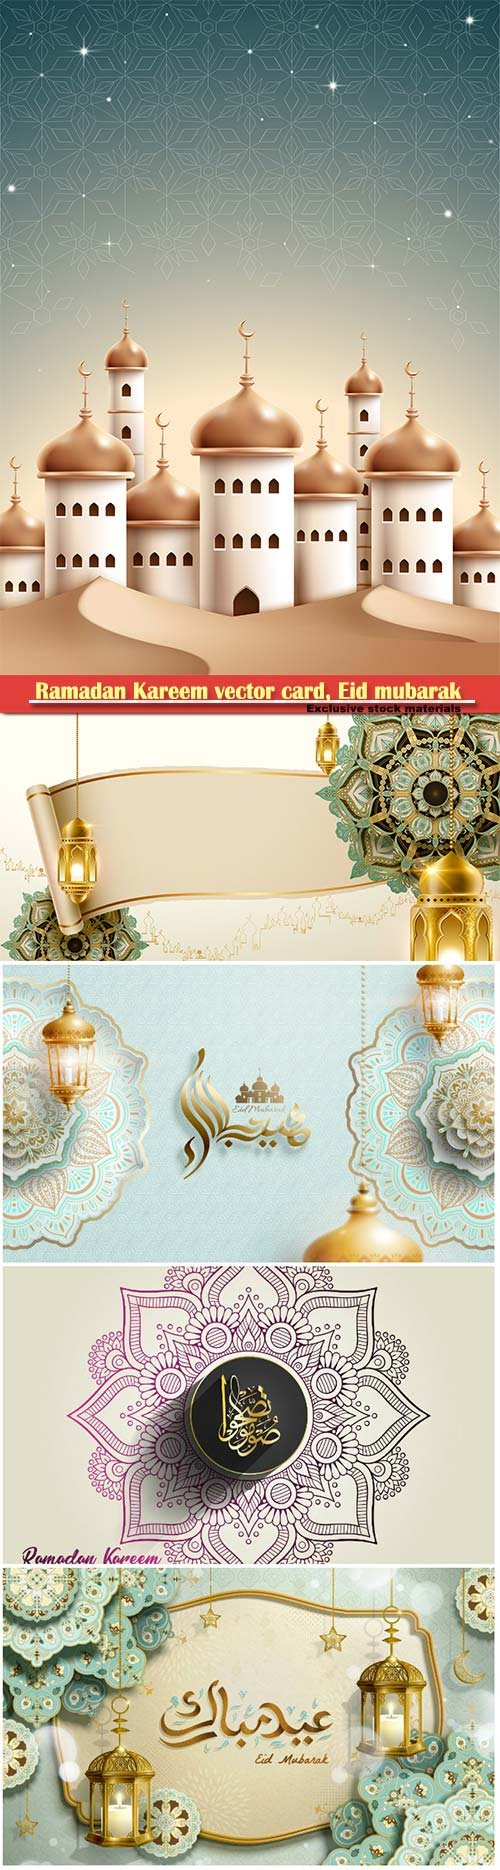 Ramadan Kareem vector card, Eid mubarak calligraphy design templates # 19